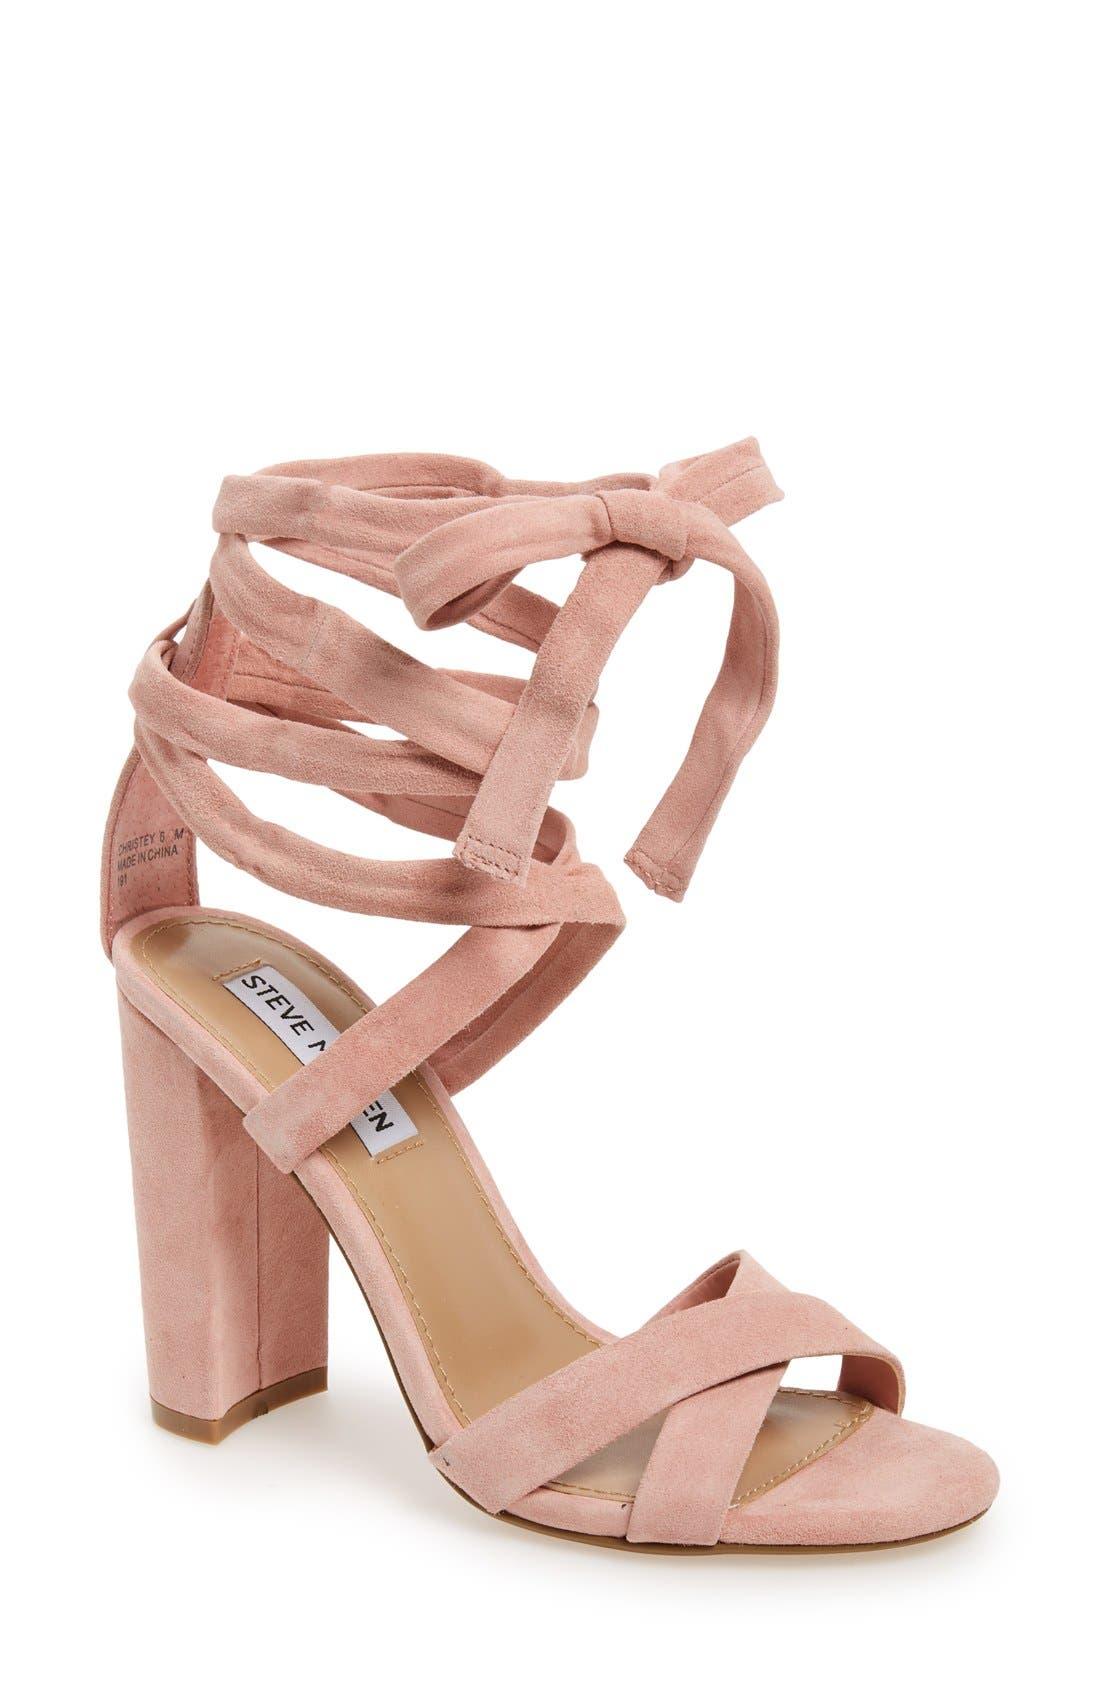 Main Image - Steve Madden 'Christey' Wraparound Ankle Tie Sandal (Women)